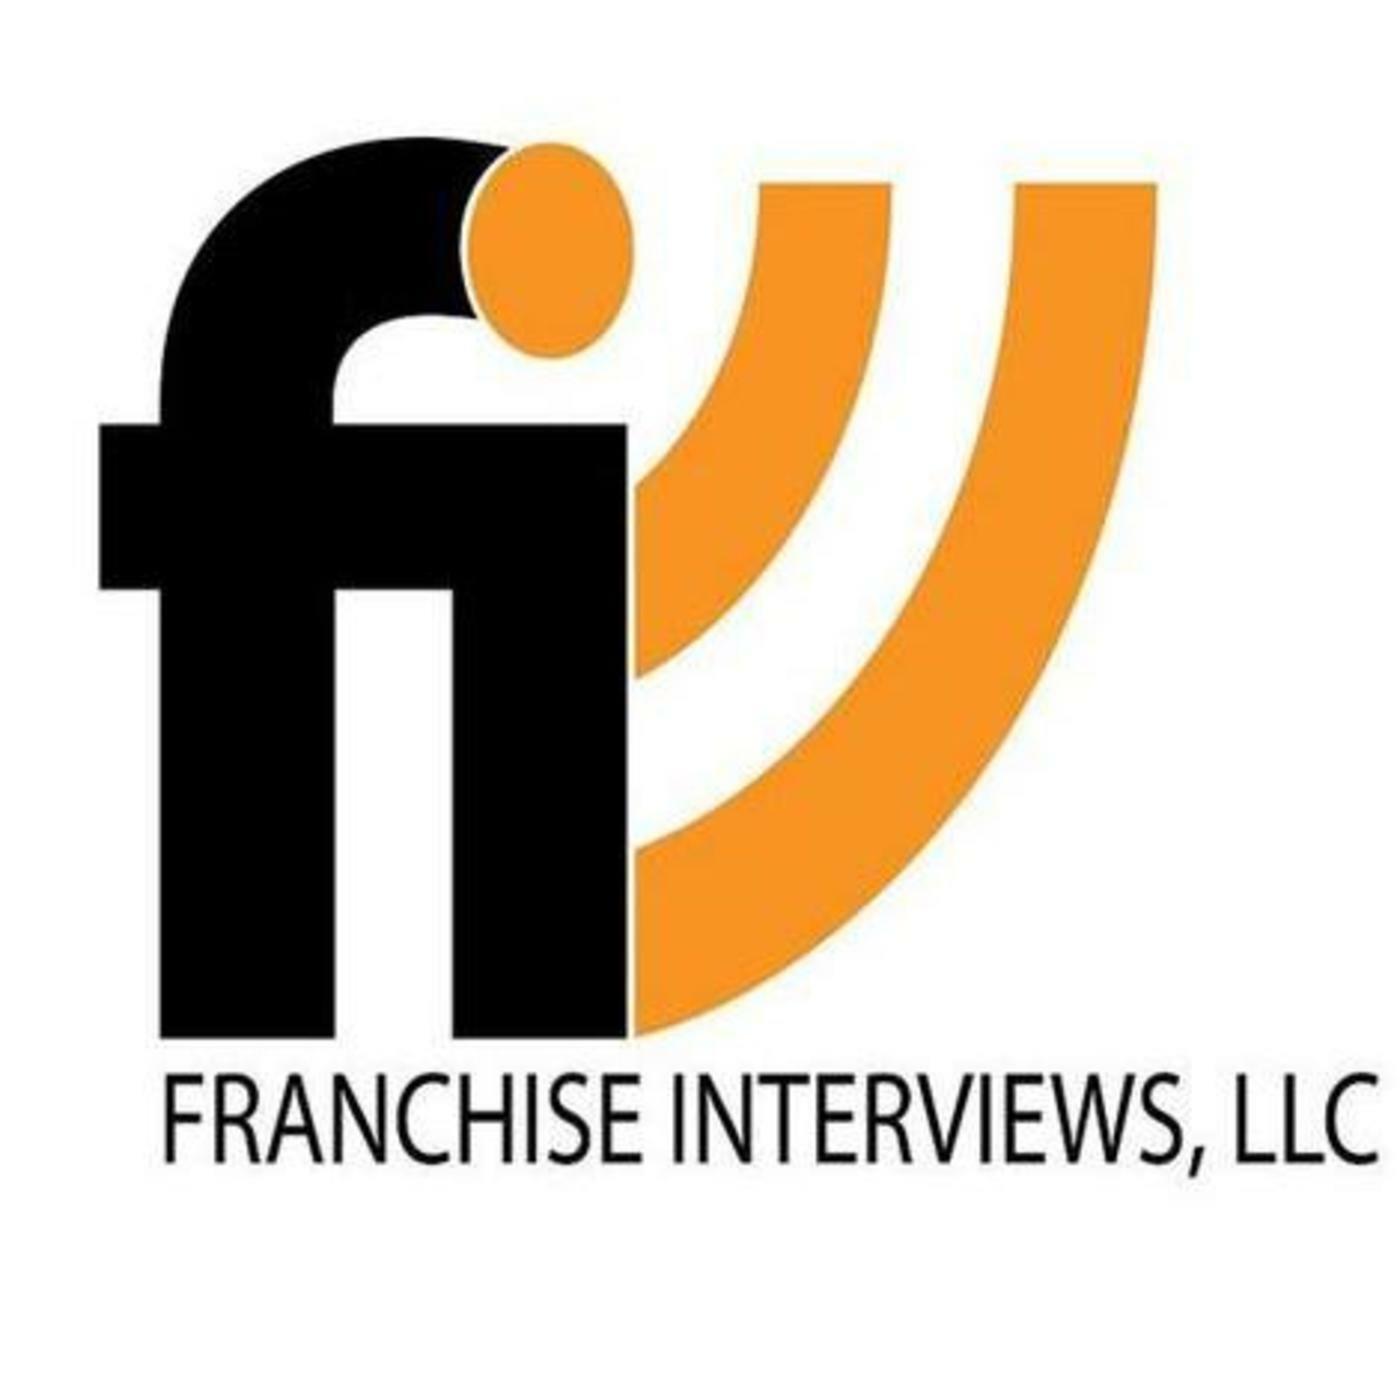 Franchise Interviews